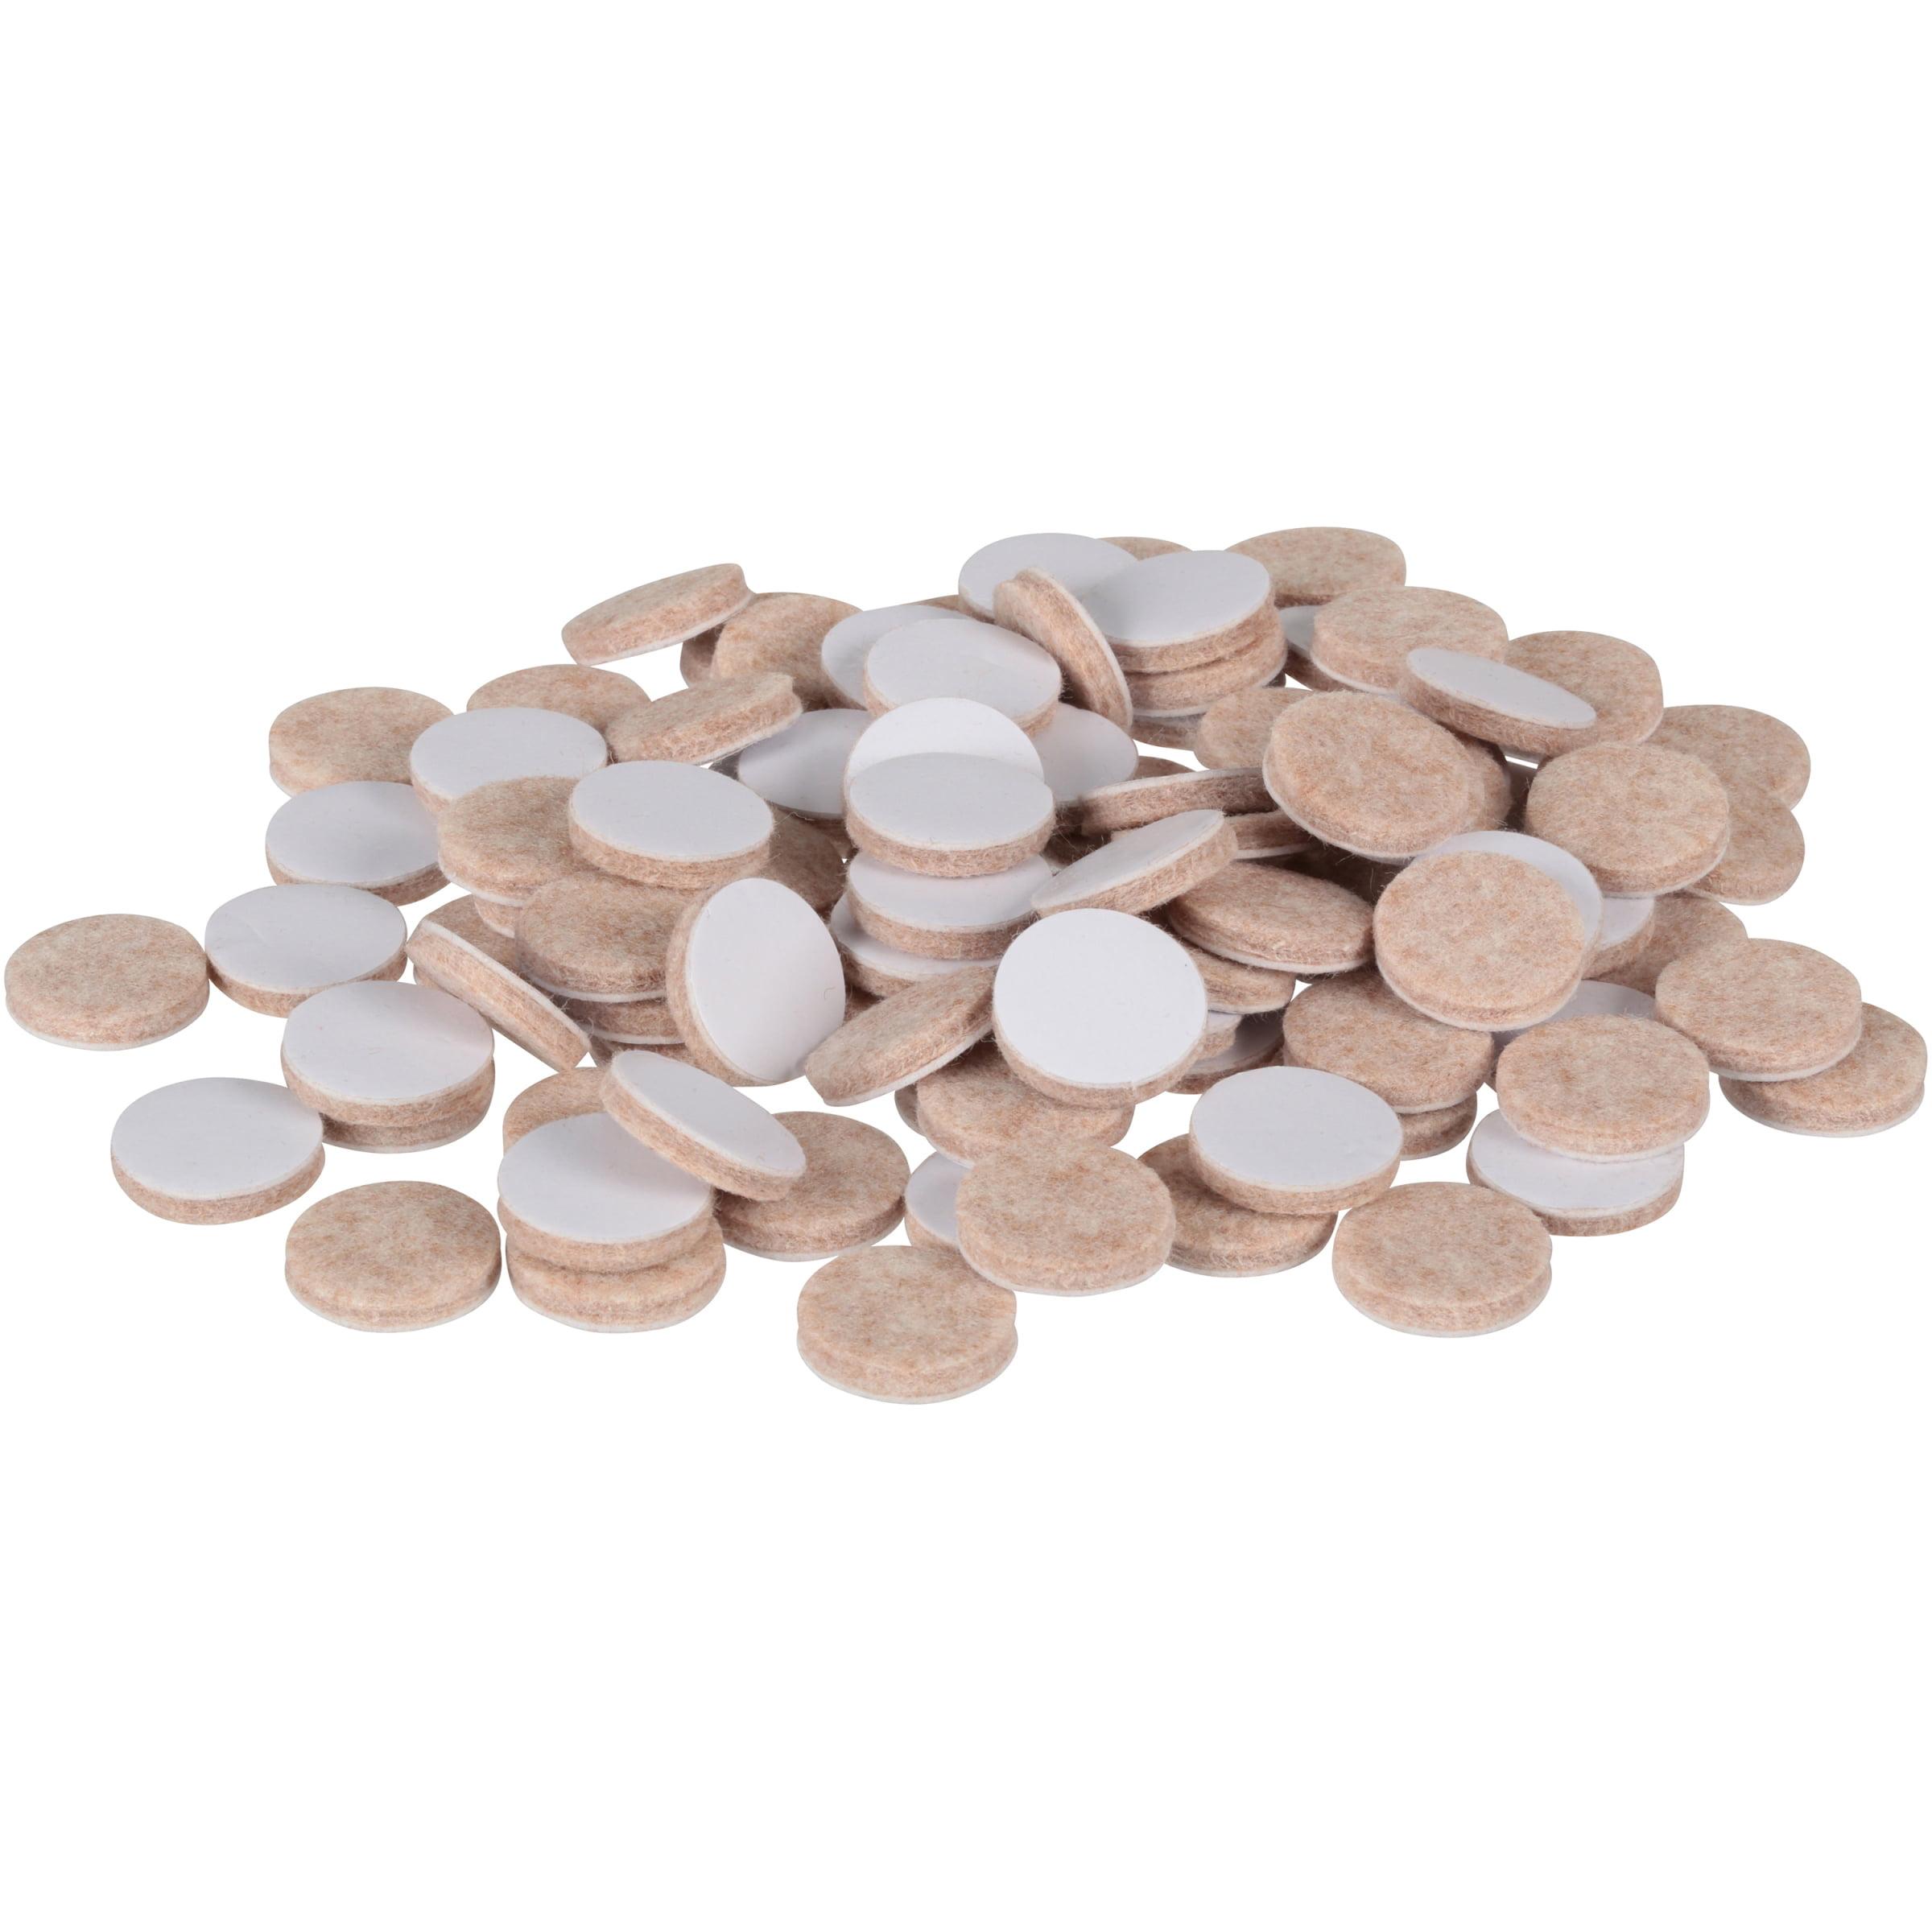 "Slipstick 1"" Round Premium Self-Stick Felt Pads Value Bag of 100 Pieces, Oatmeal"